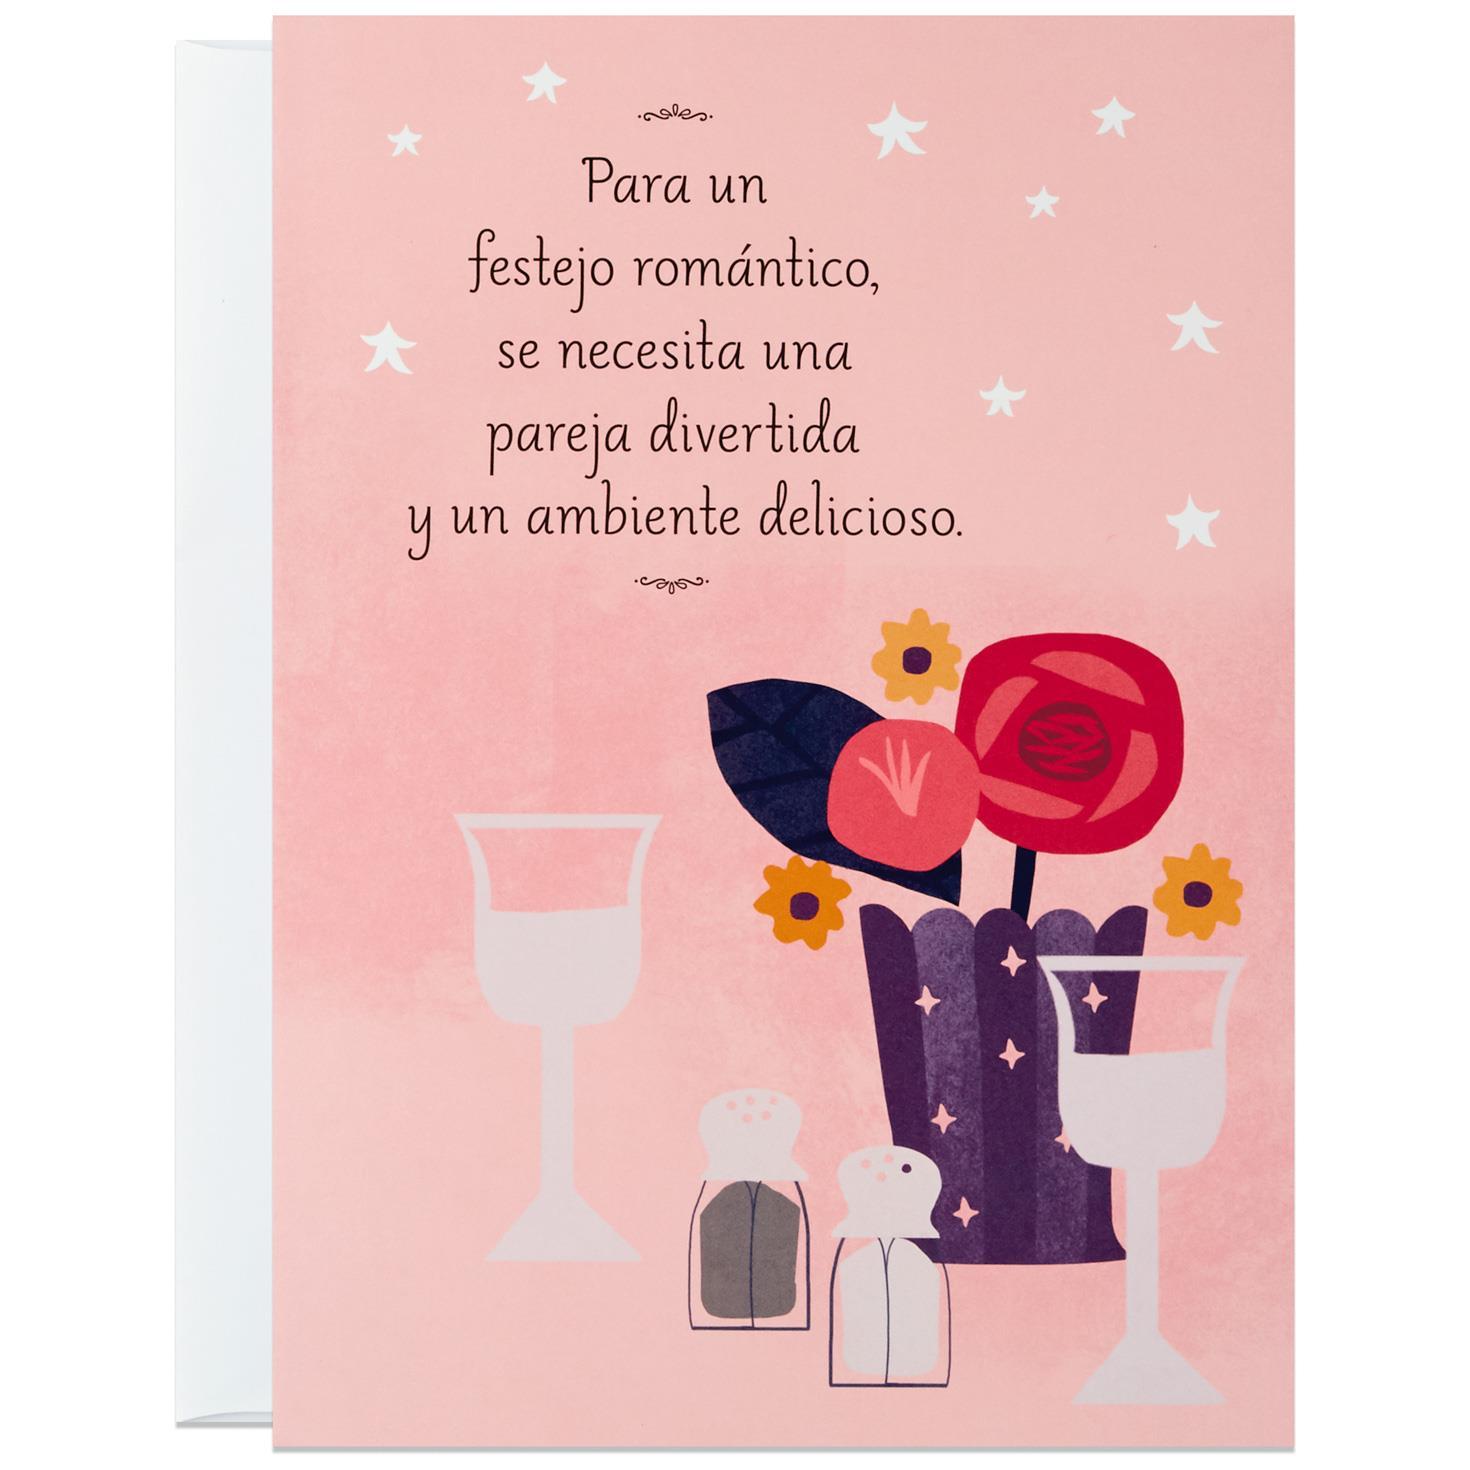 Romantic Celebration Large Spanish Language Pop Up Love Card Lfs Jpg 1470x1470 Hallmark Birthday